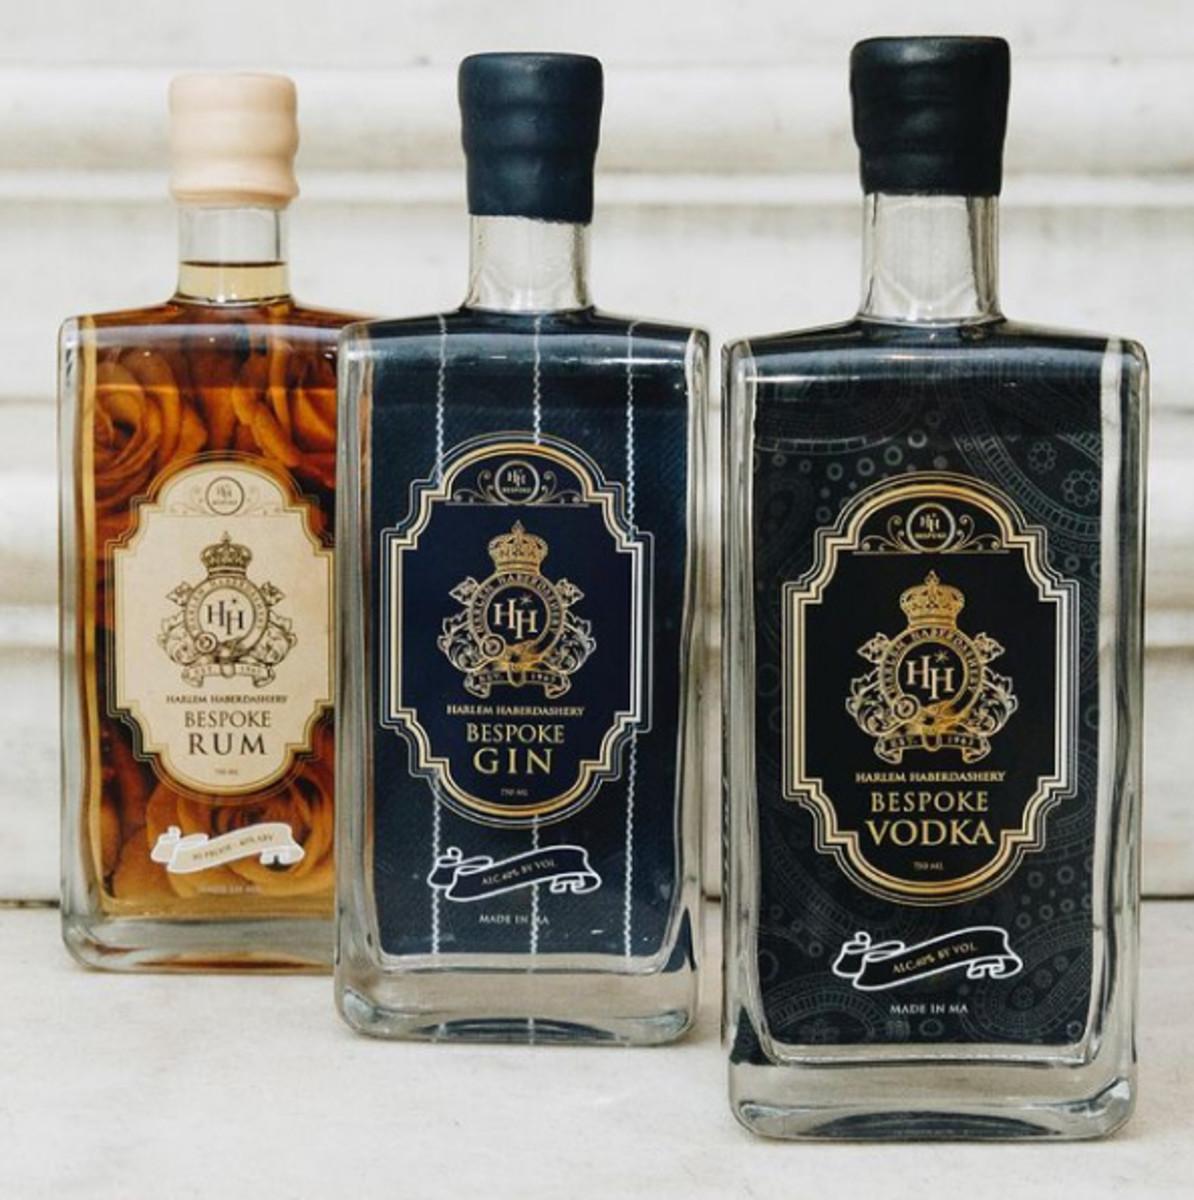 HH Bespoke Spirits rum, gin, and vodka